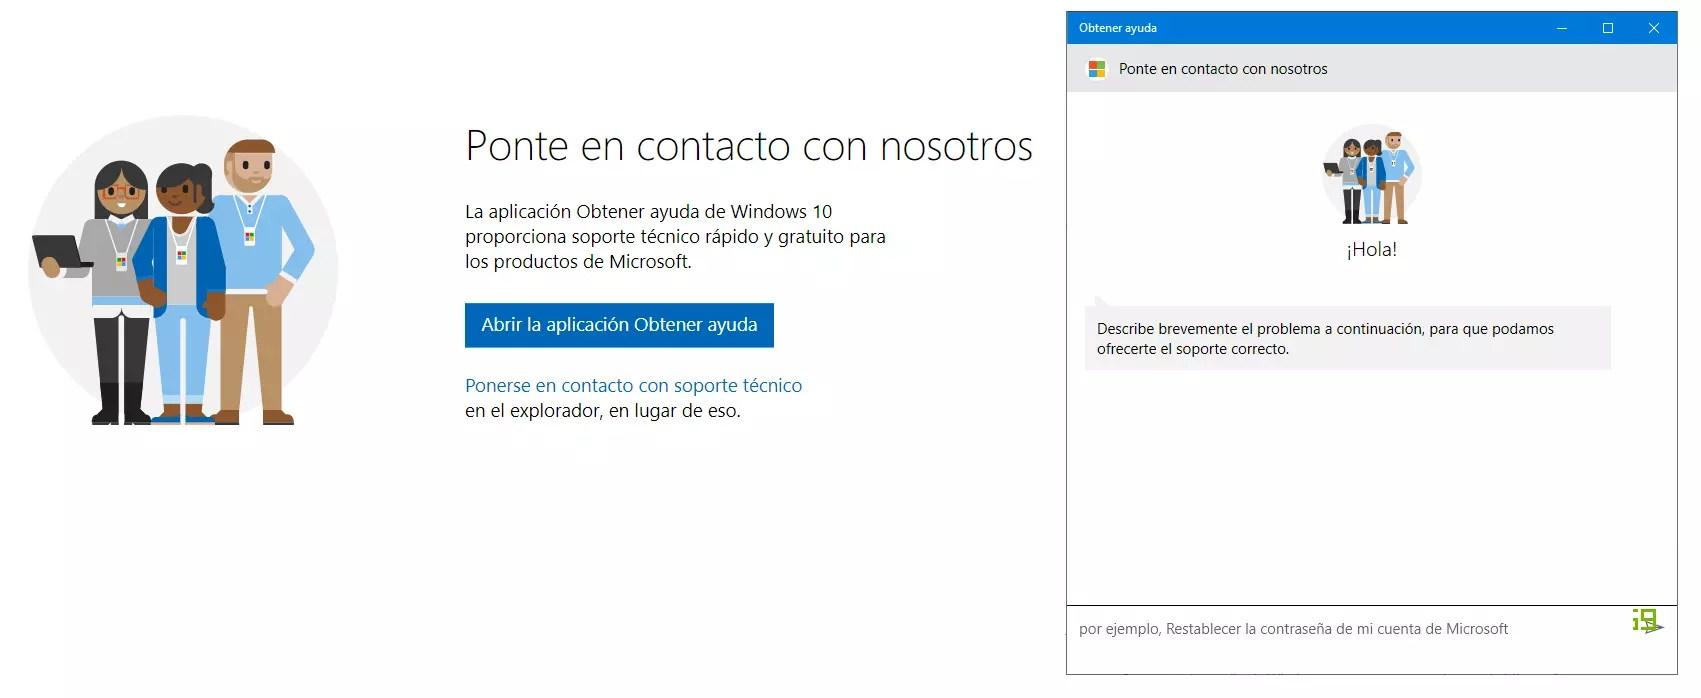 Windows 10 Archives – Página 10 de 27 – Back with the